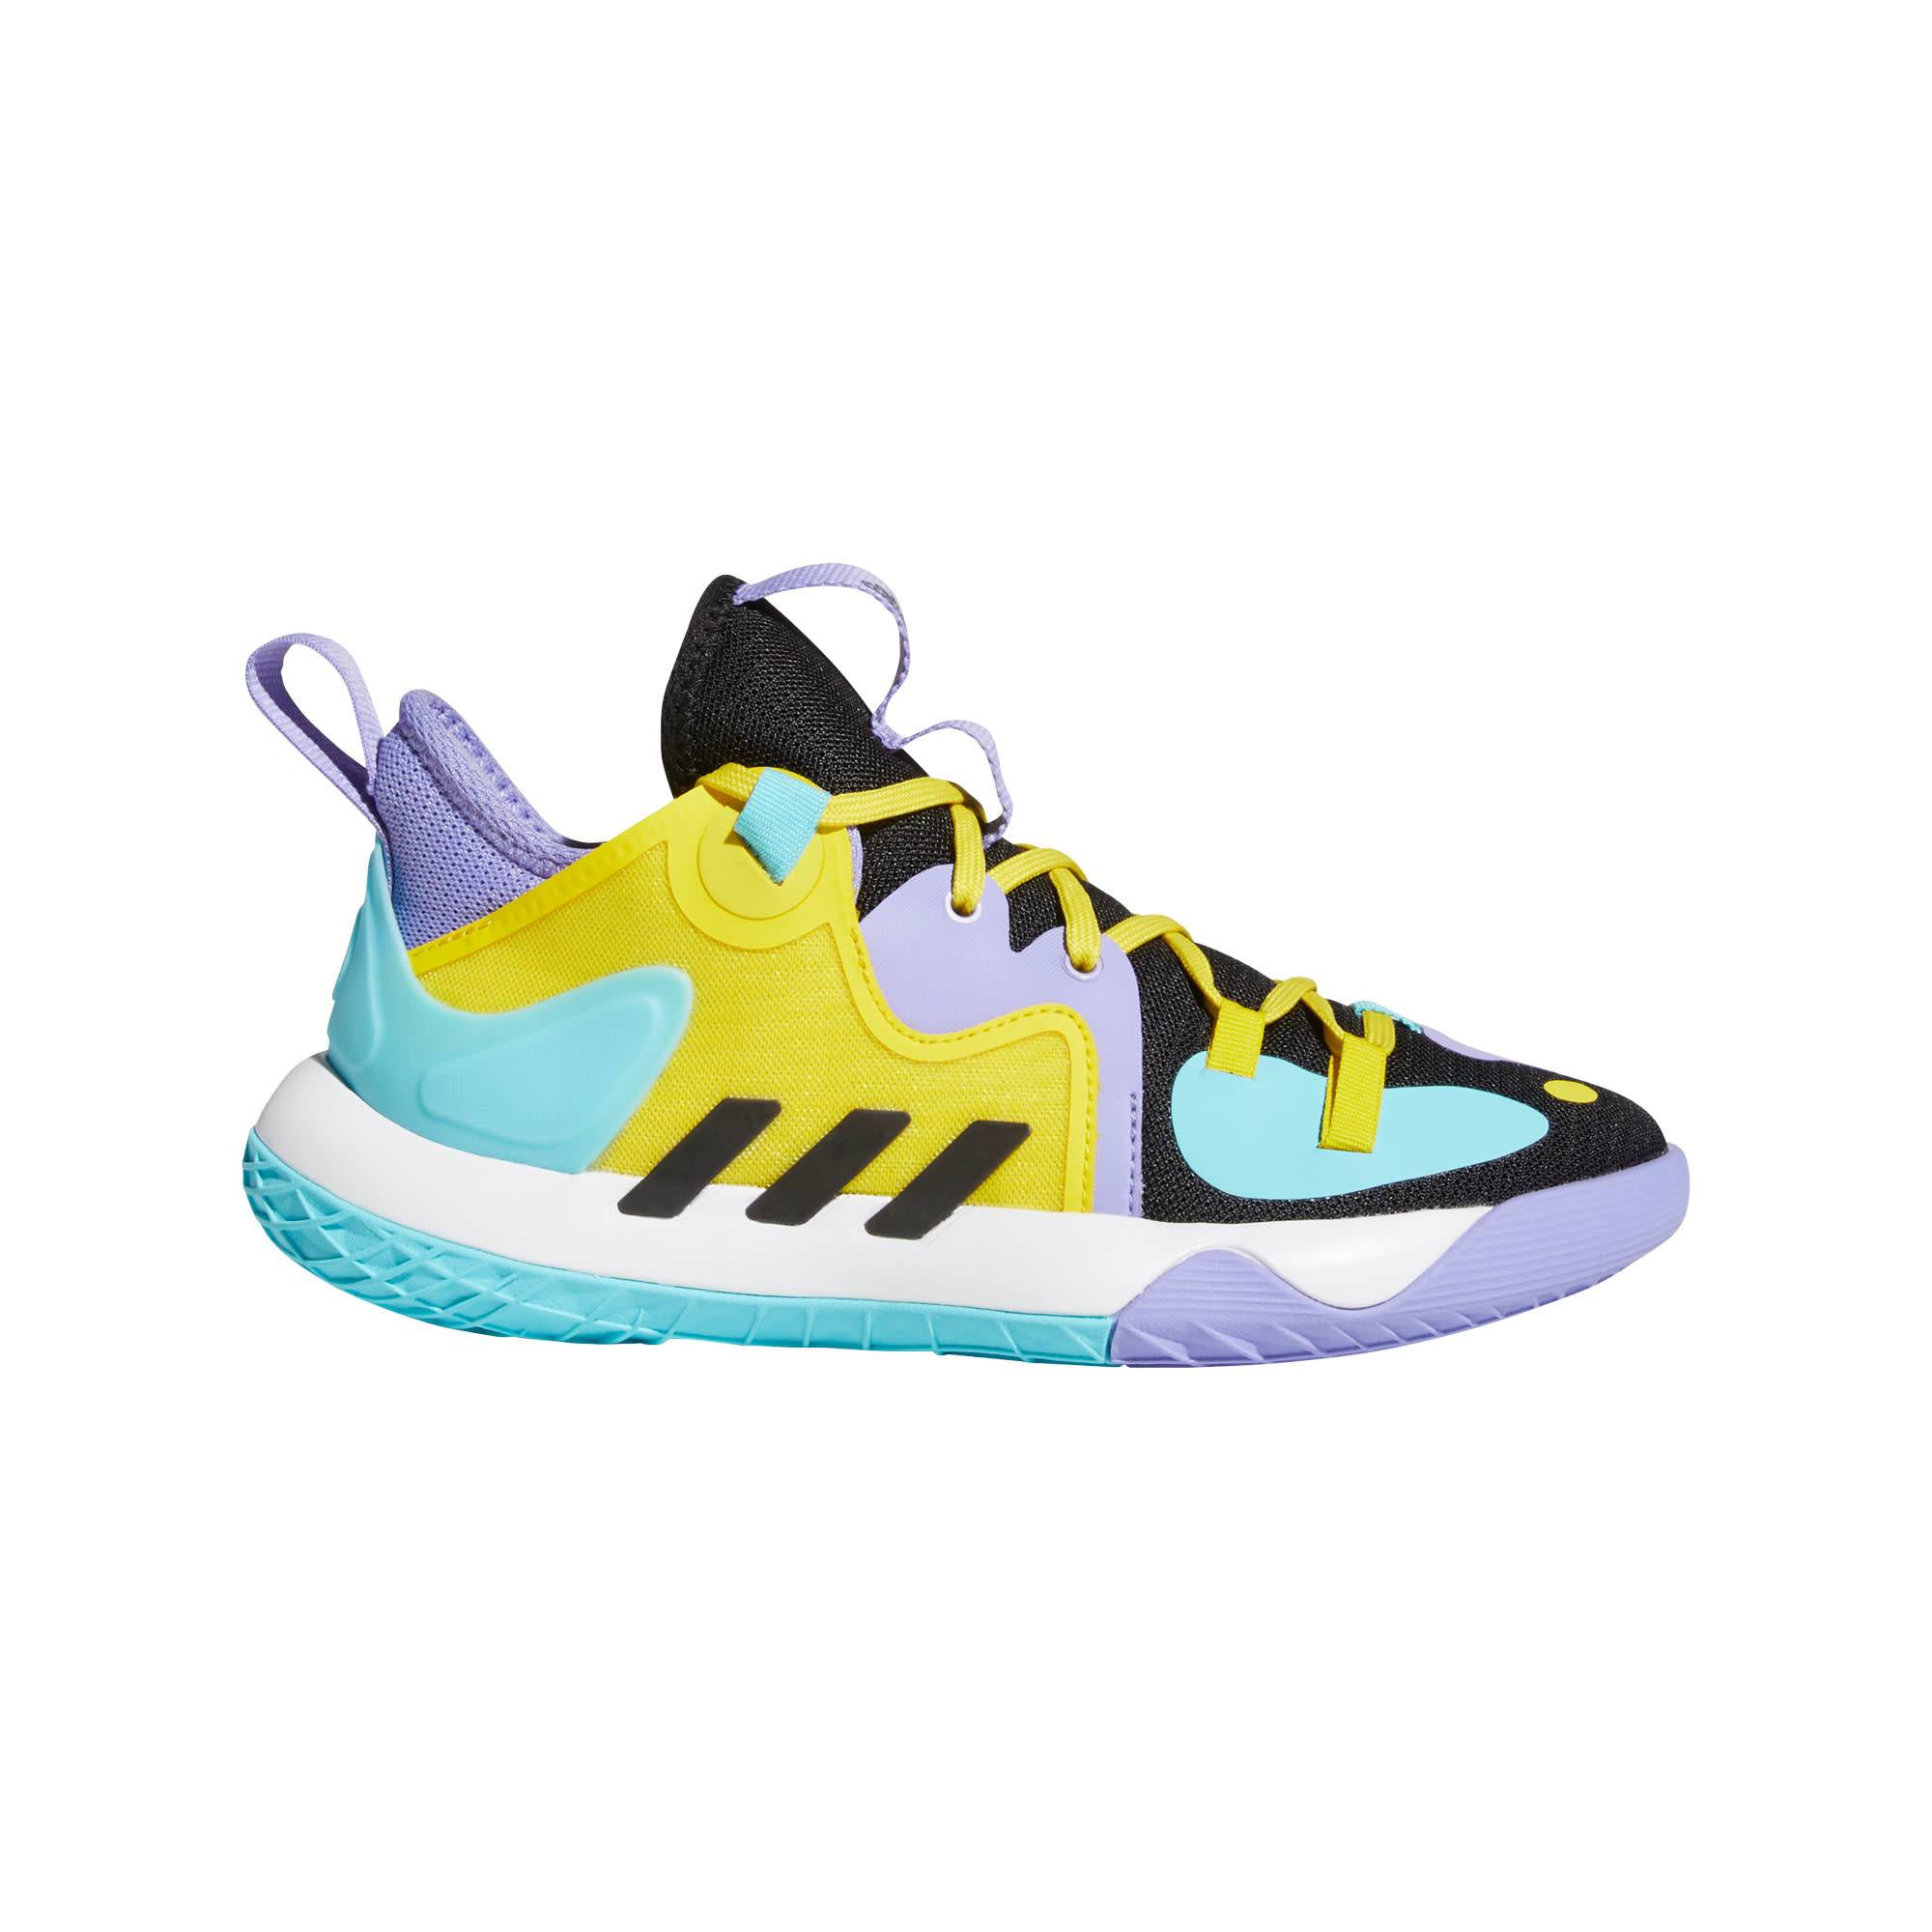 Adidas Harden Stepback 2 36 2/3 Core Black/Team Yellow